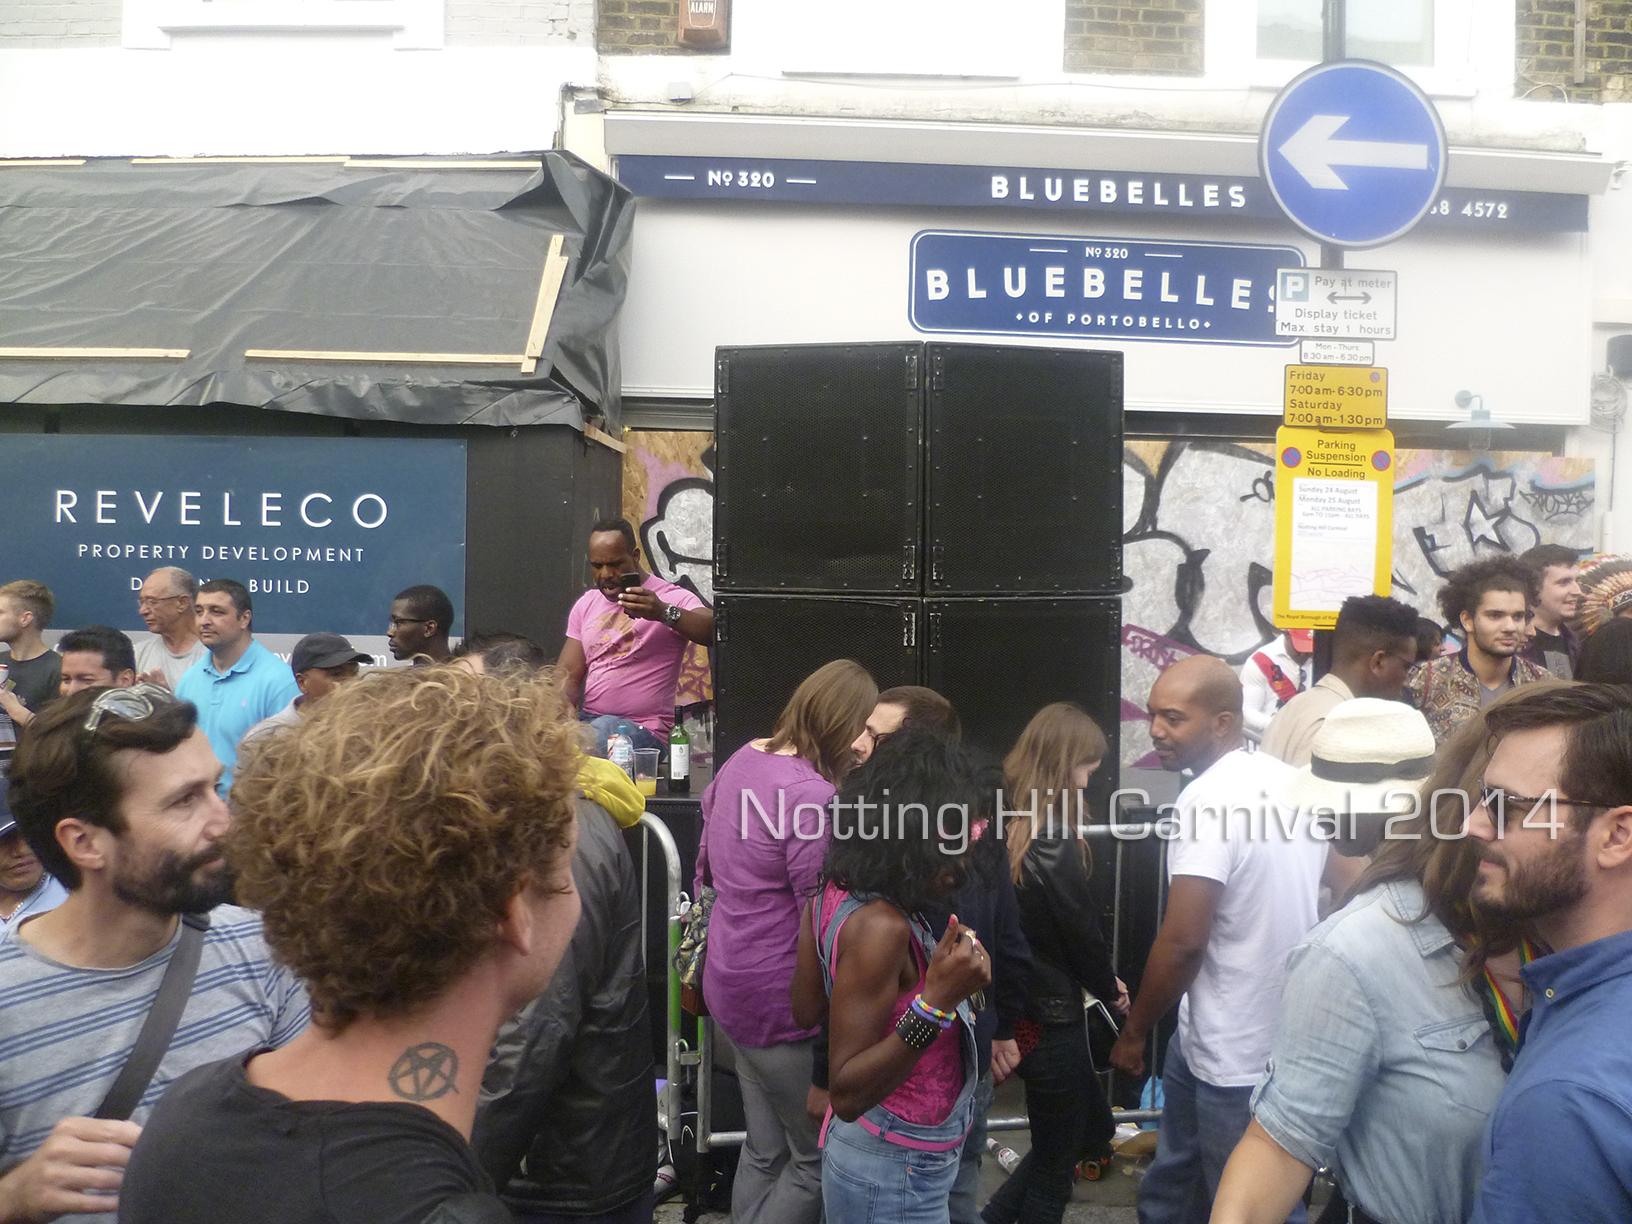 Notting-Hill-Carnival-2014-Street-Sound-System-29